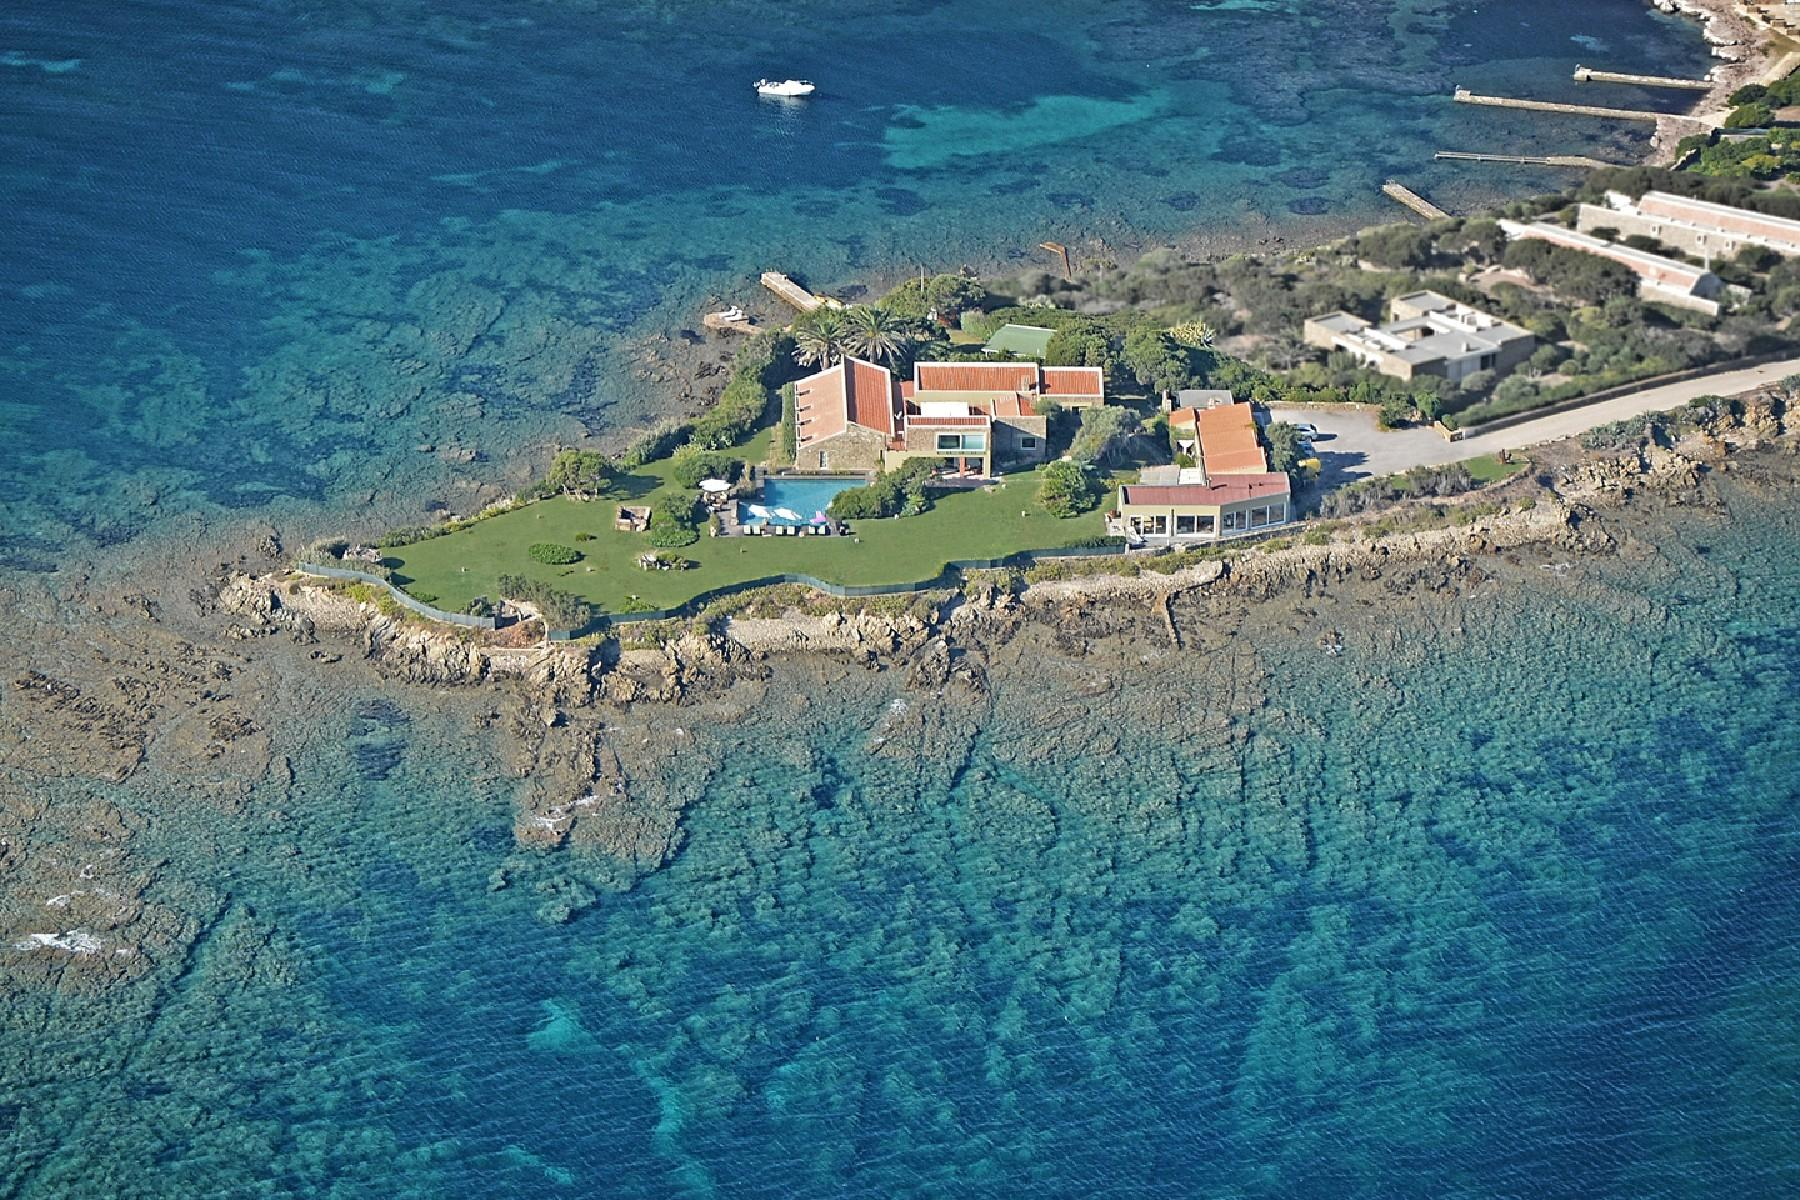 Villa pieds-dans-l'eau su una piccola penisola privata - 2